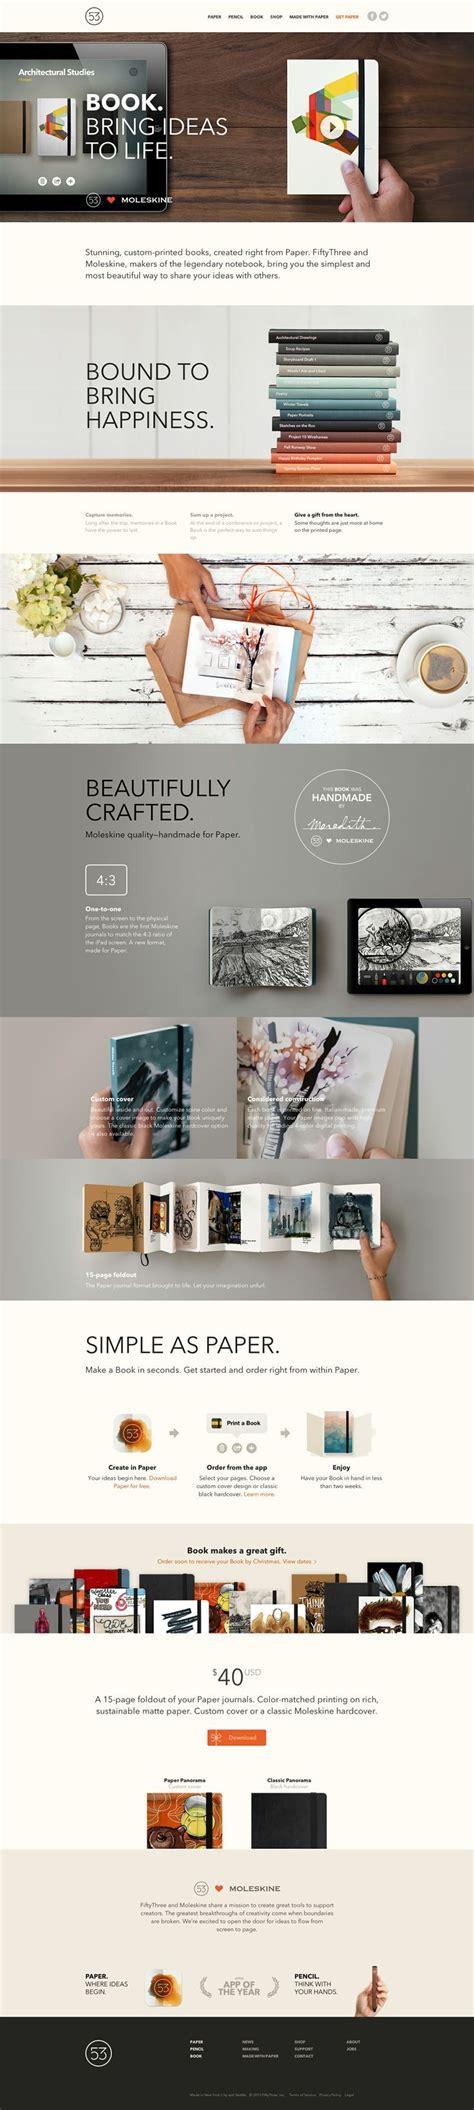 web design layout jobs best 25 web design jobs ideas on pinterest web design